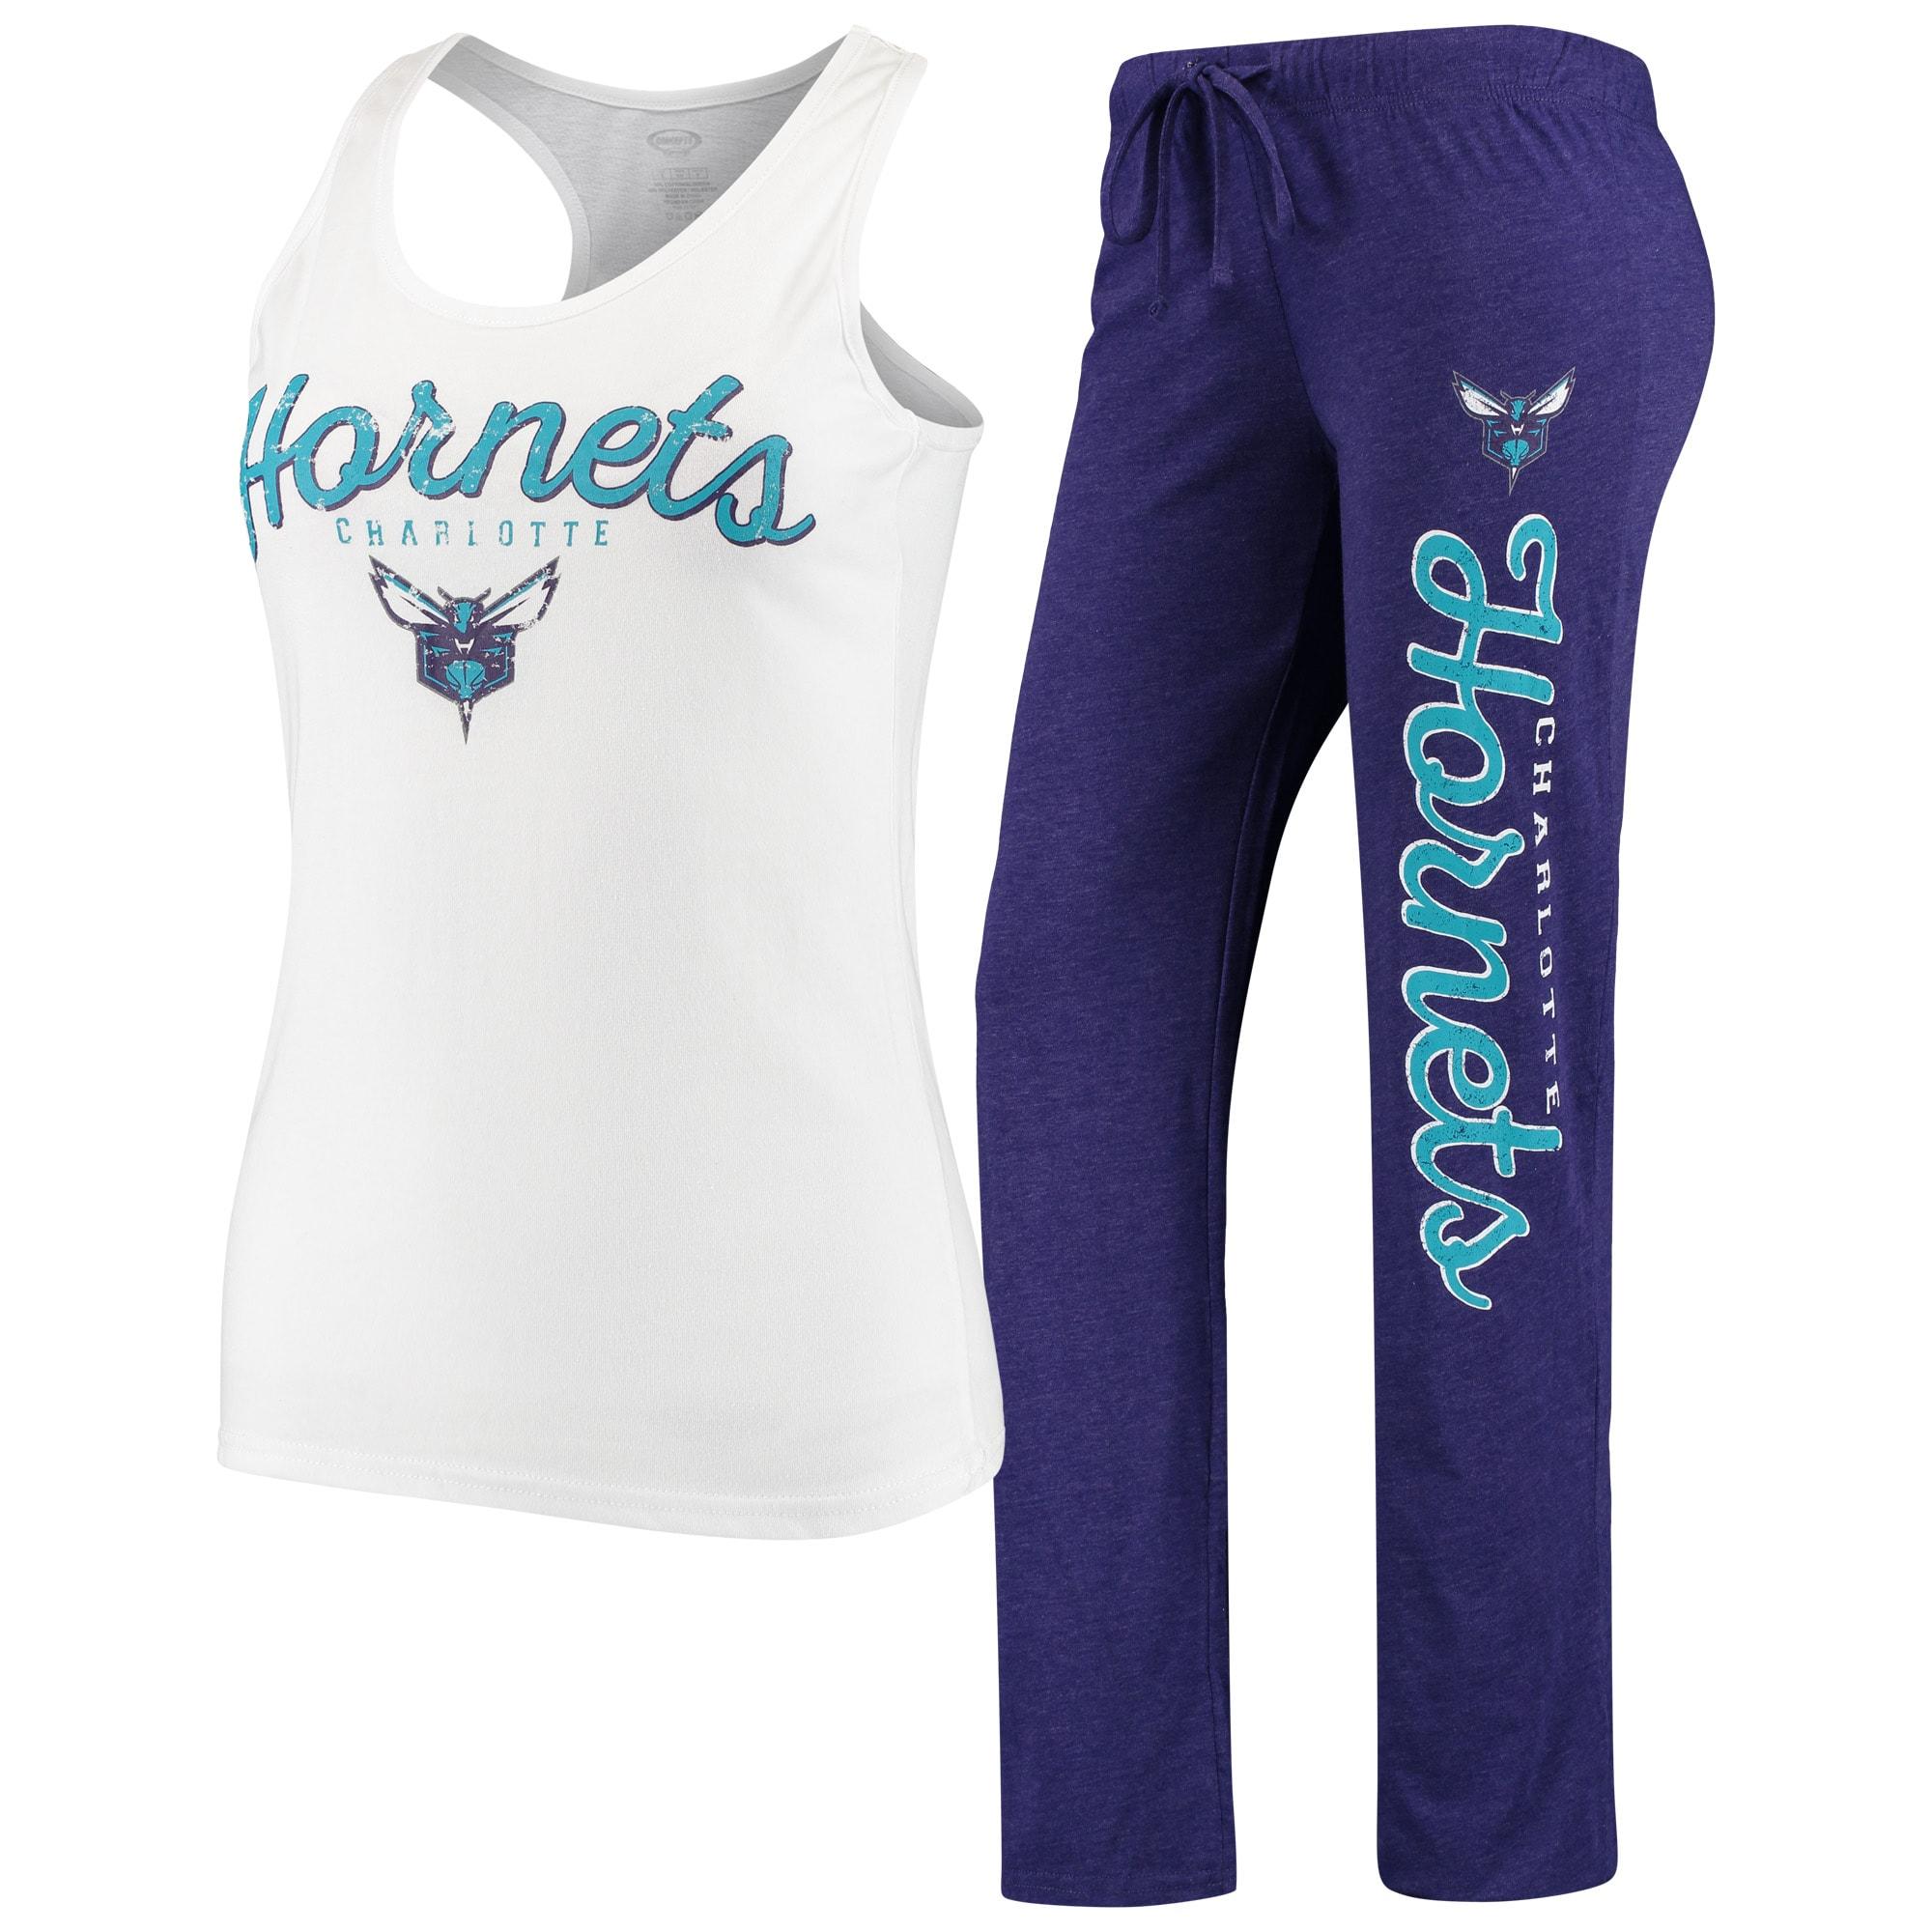 Charlotte Hornets Concepts Sport Women's Topic Tank Top & Pants Sleep Set - White/Purple